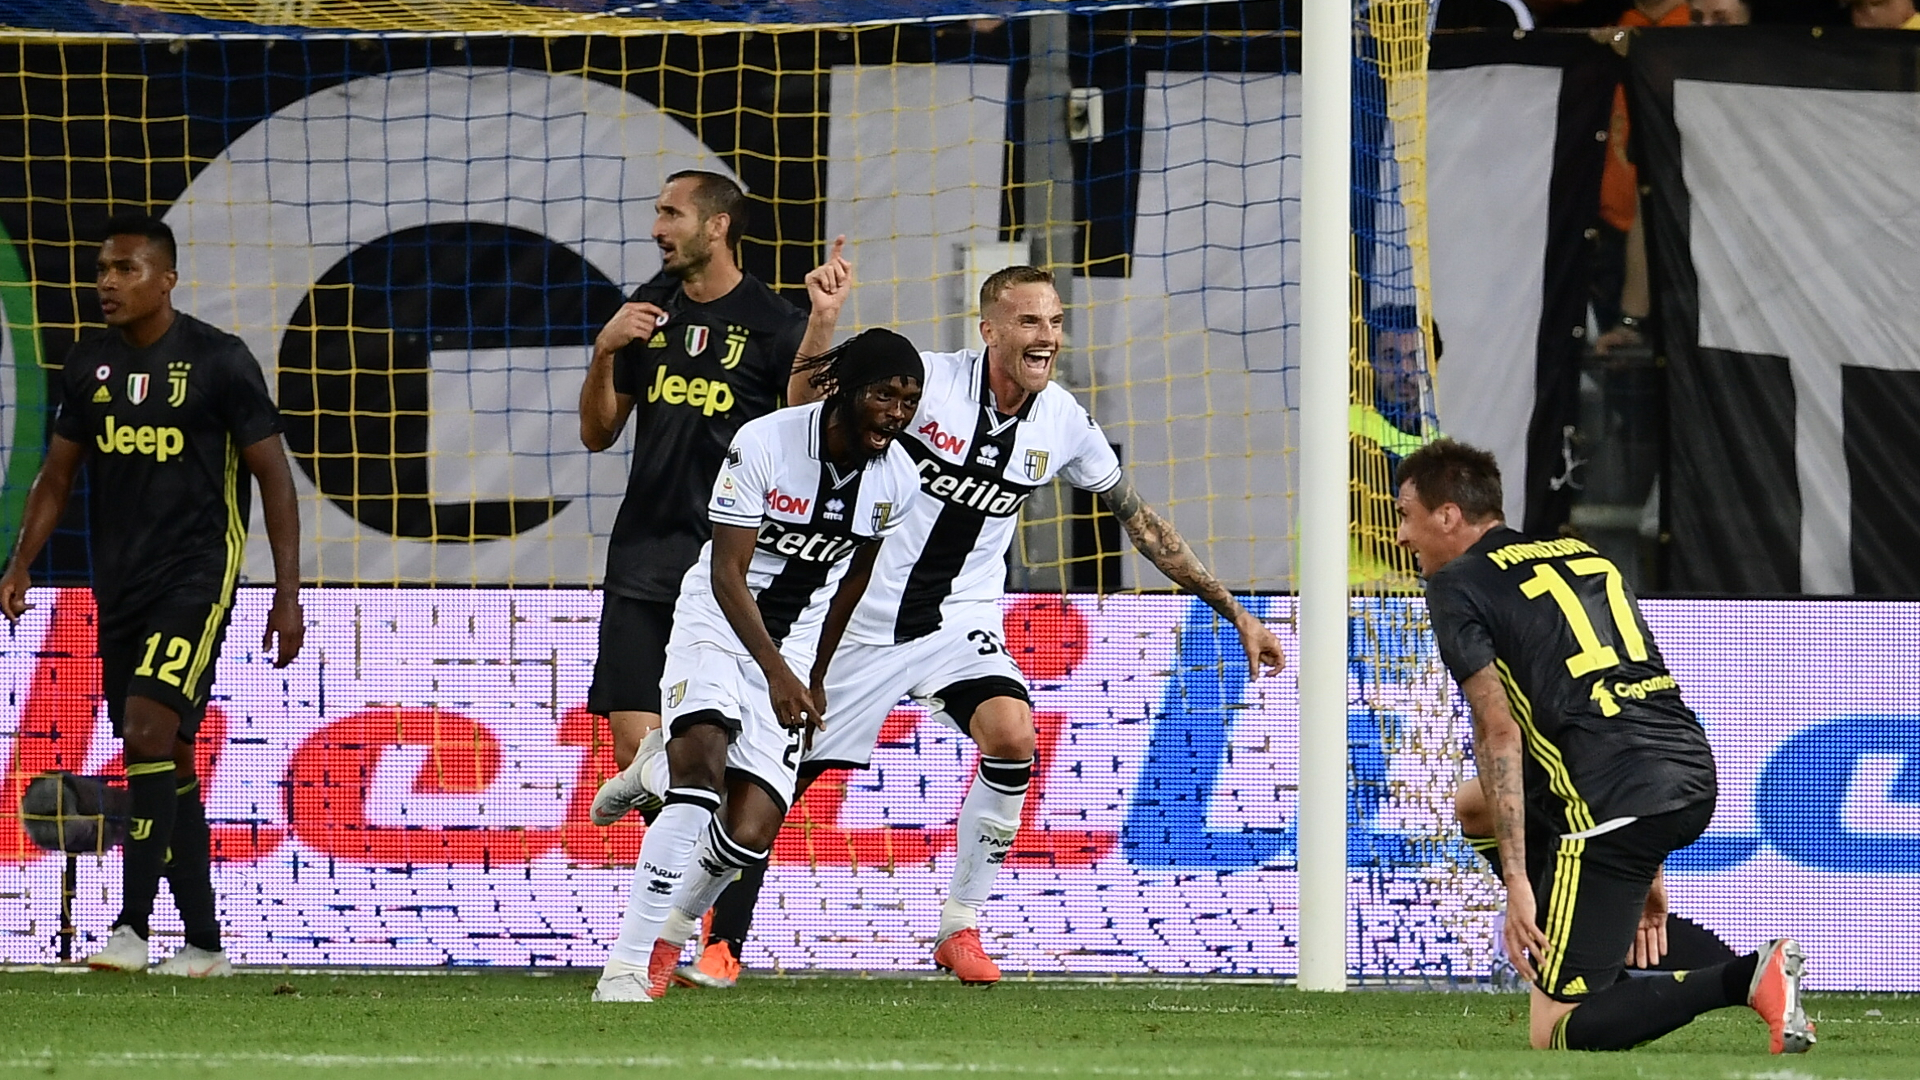 Gervinho Parma Juventus